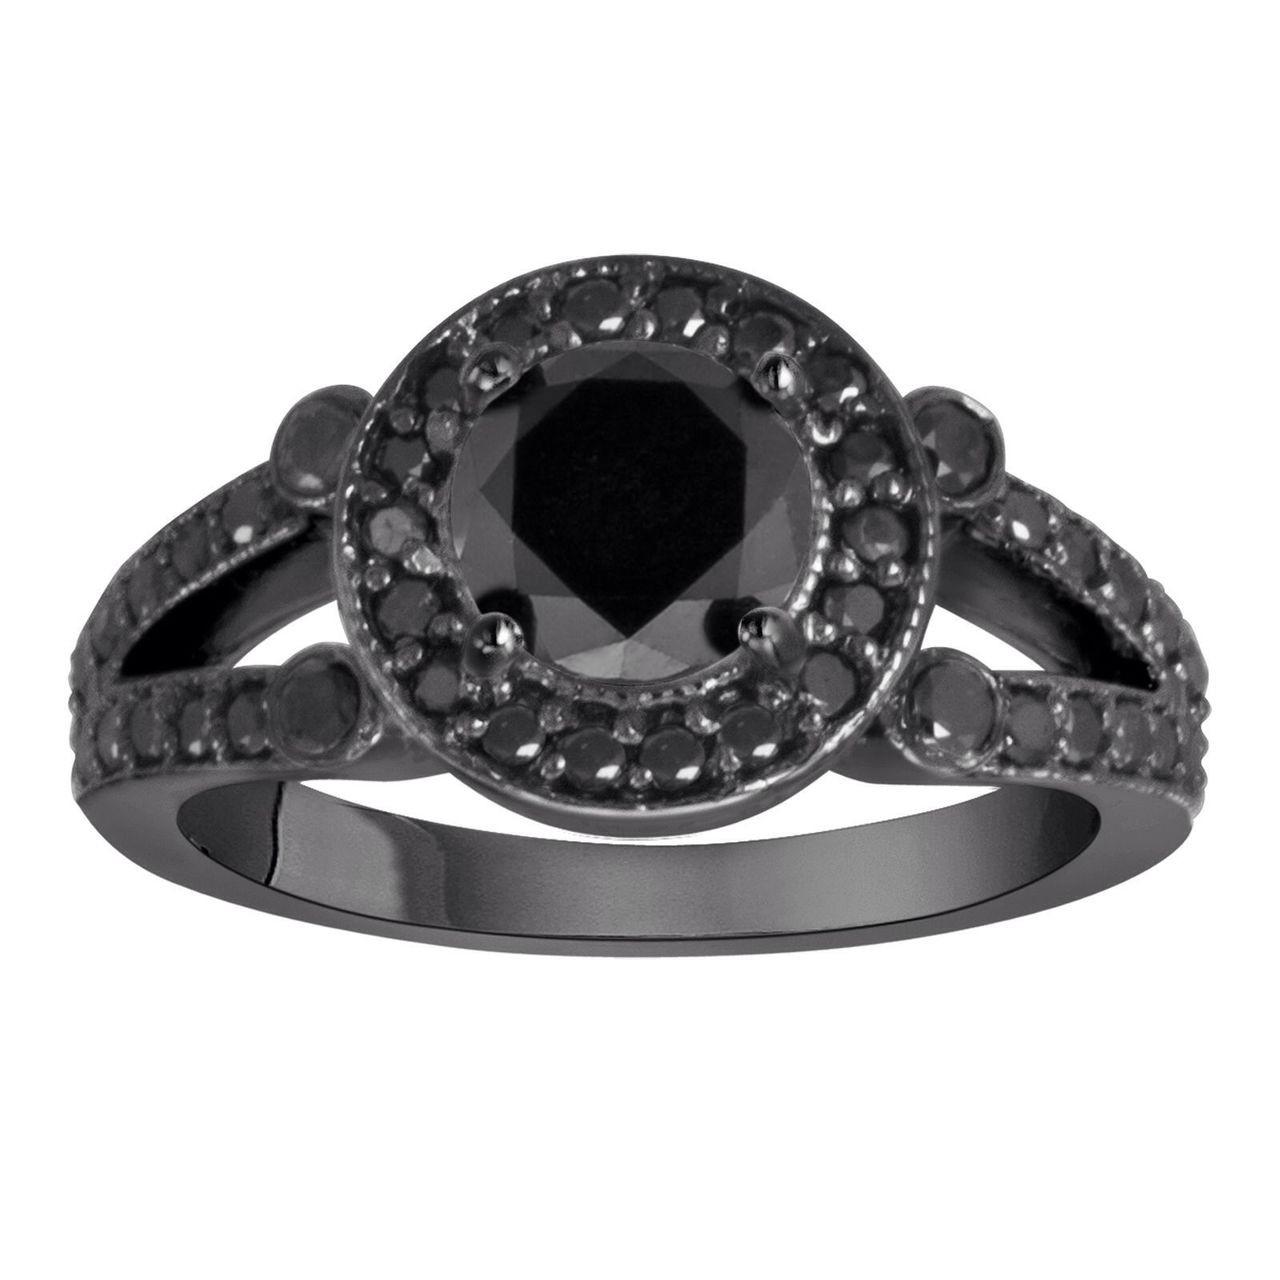 Black Diamond Wedding Ring.Black Diamond Engagement Ring 14k Black Gold 1 60 Carat Unique Halo Handmade